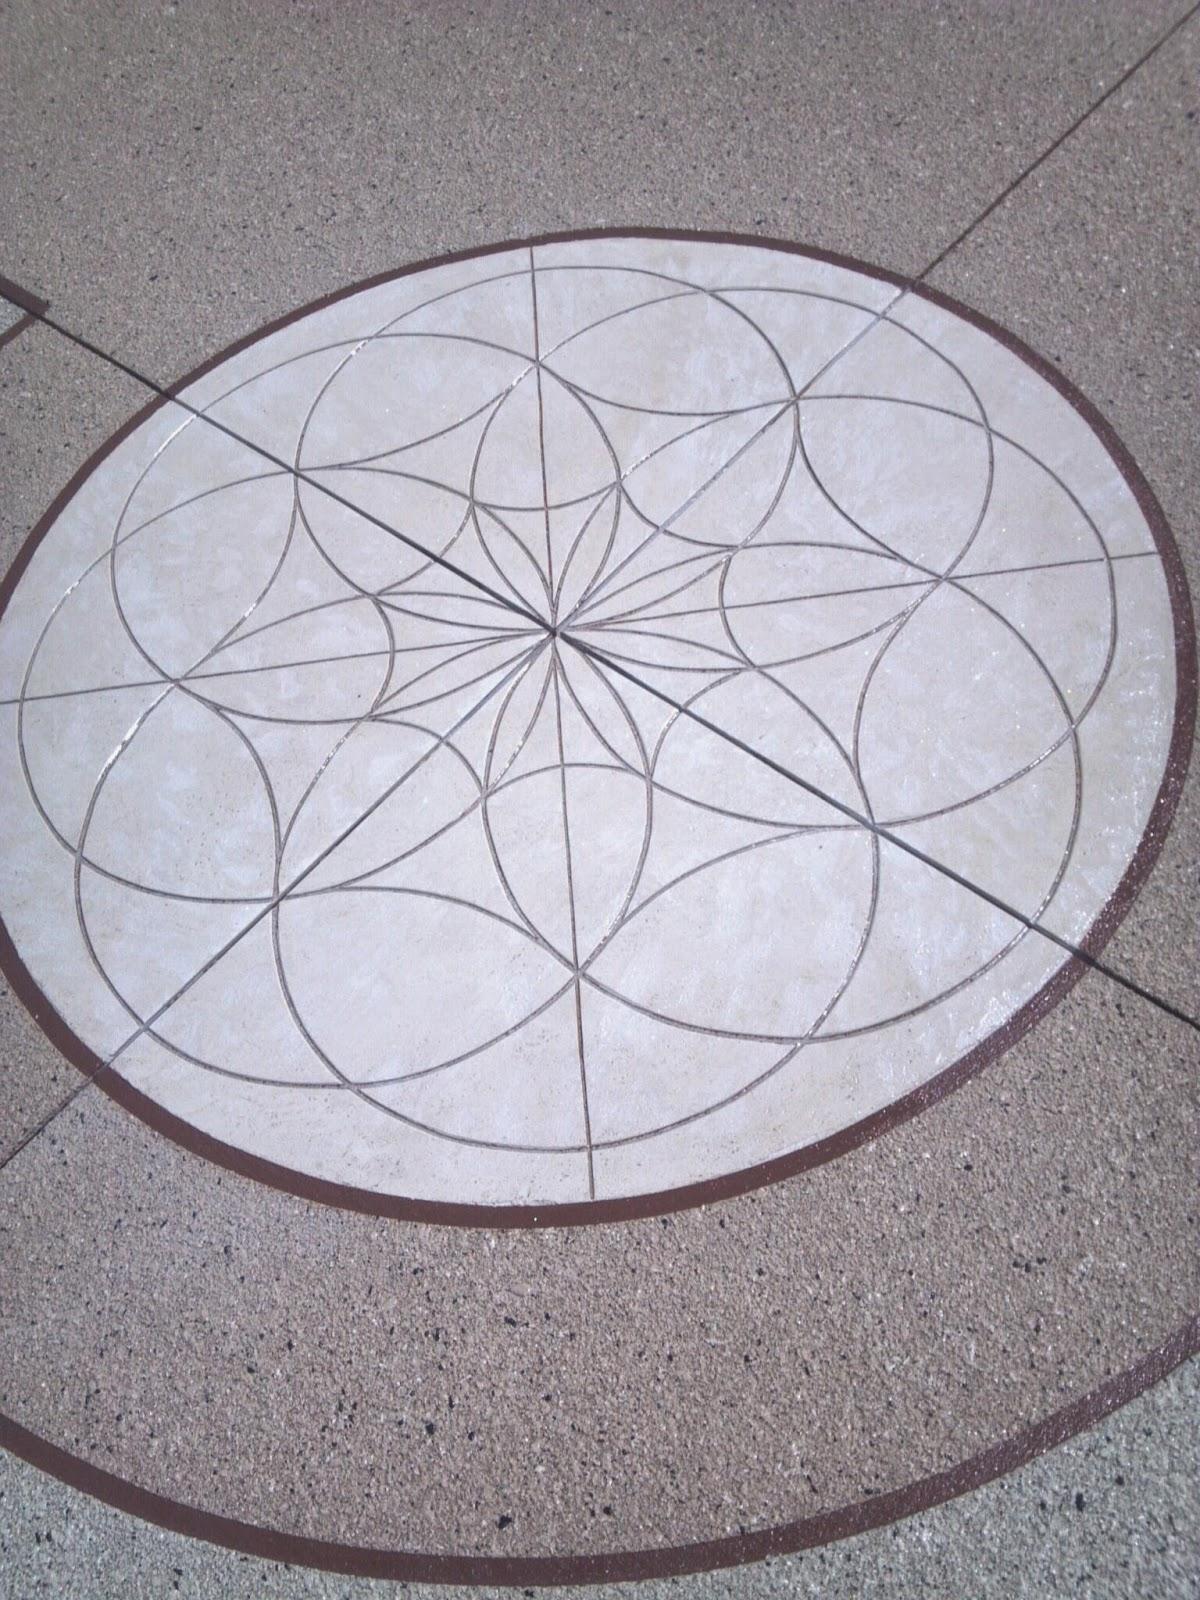 CustomRamDesign, Inc.: Kaleidoscope.